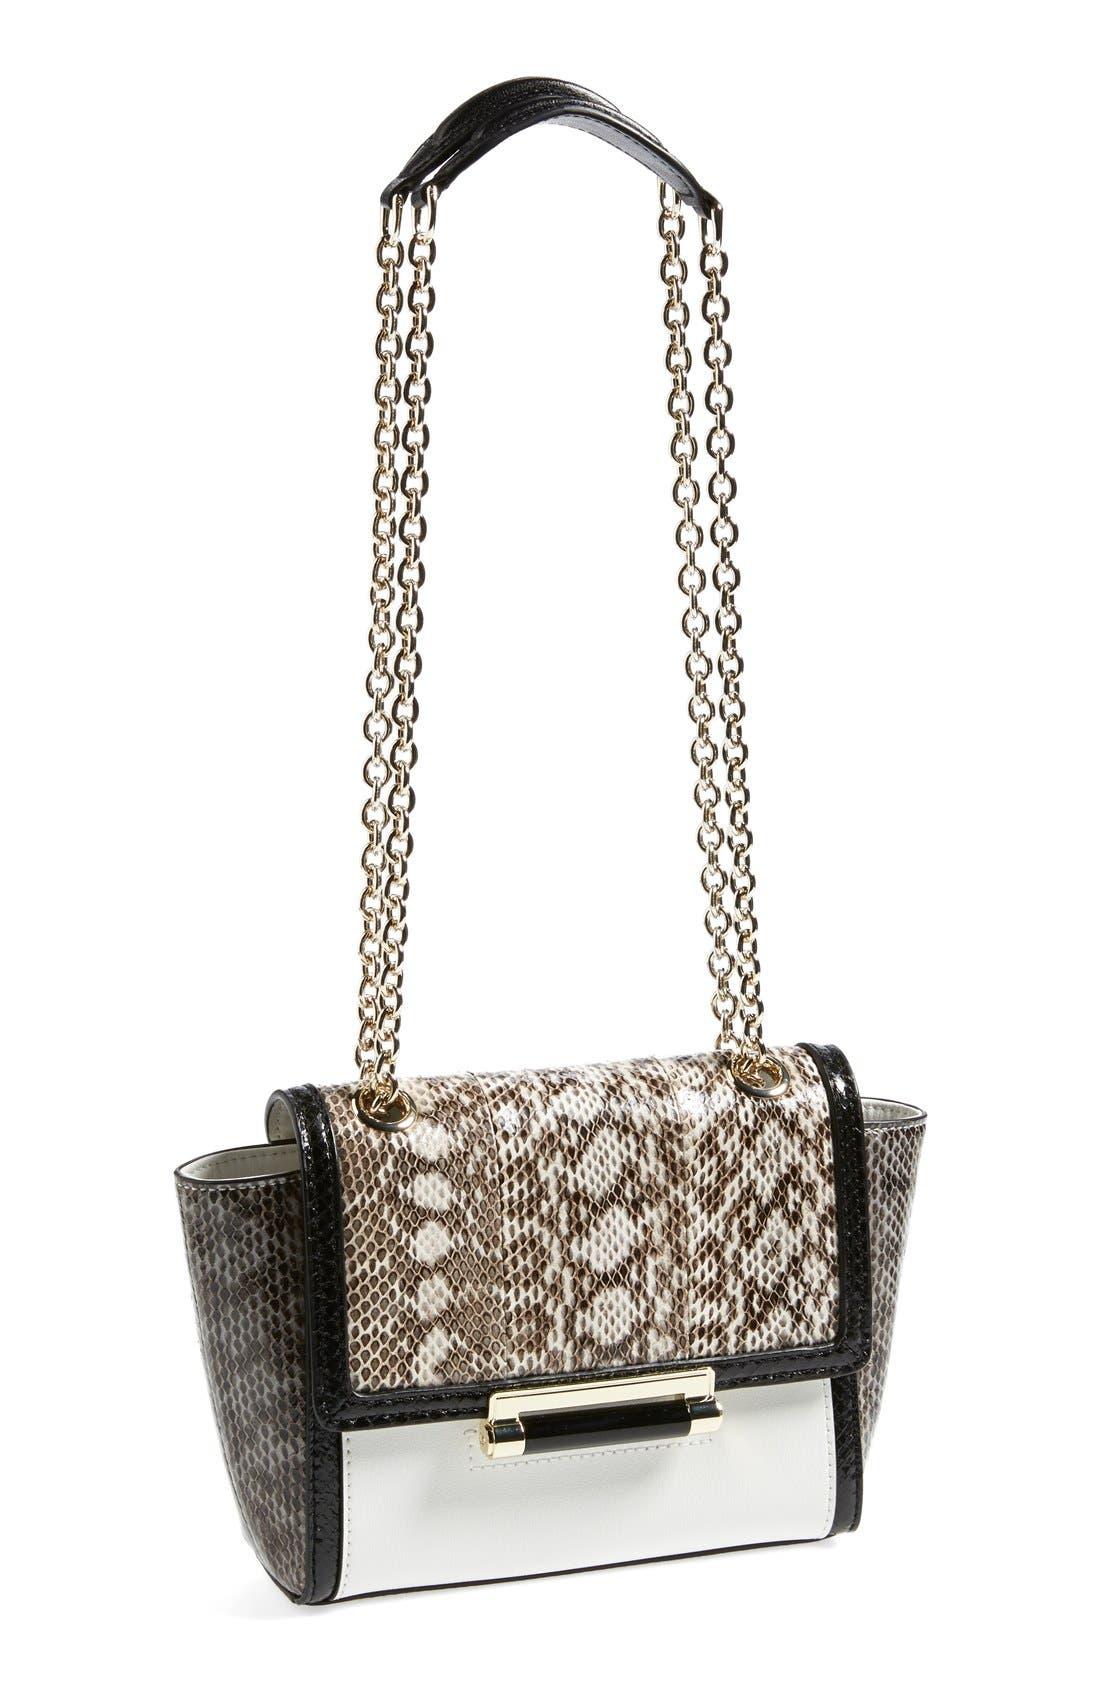 Main Image - Diane Von Furstenberg '440 - Mini' Genuine Snakeskin & Leather Crossbody Bag